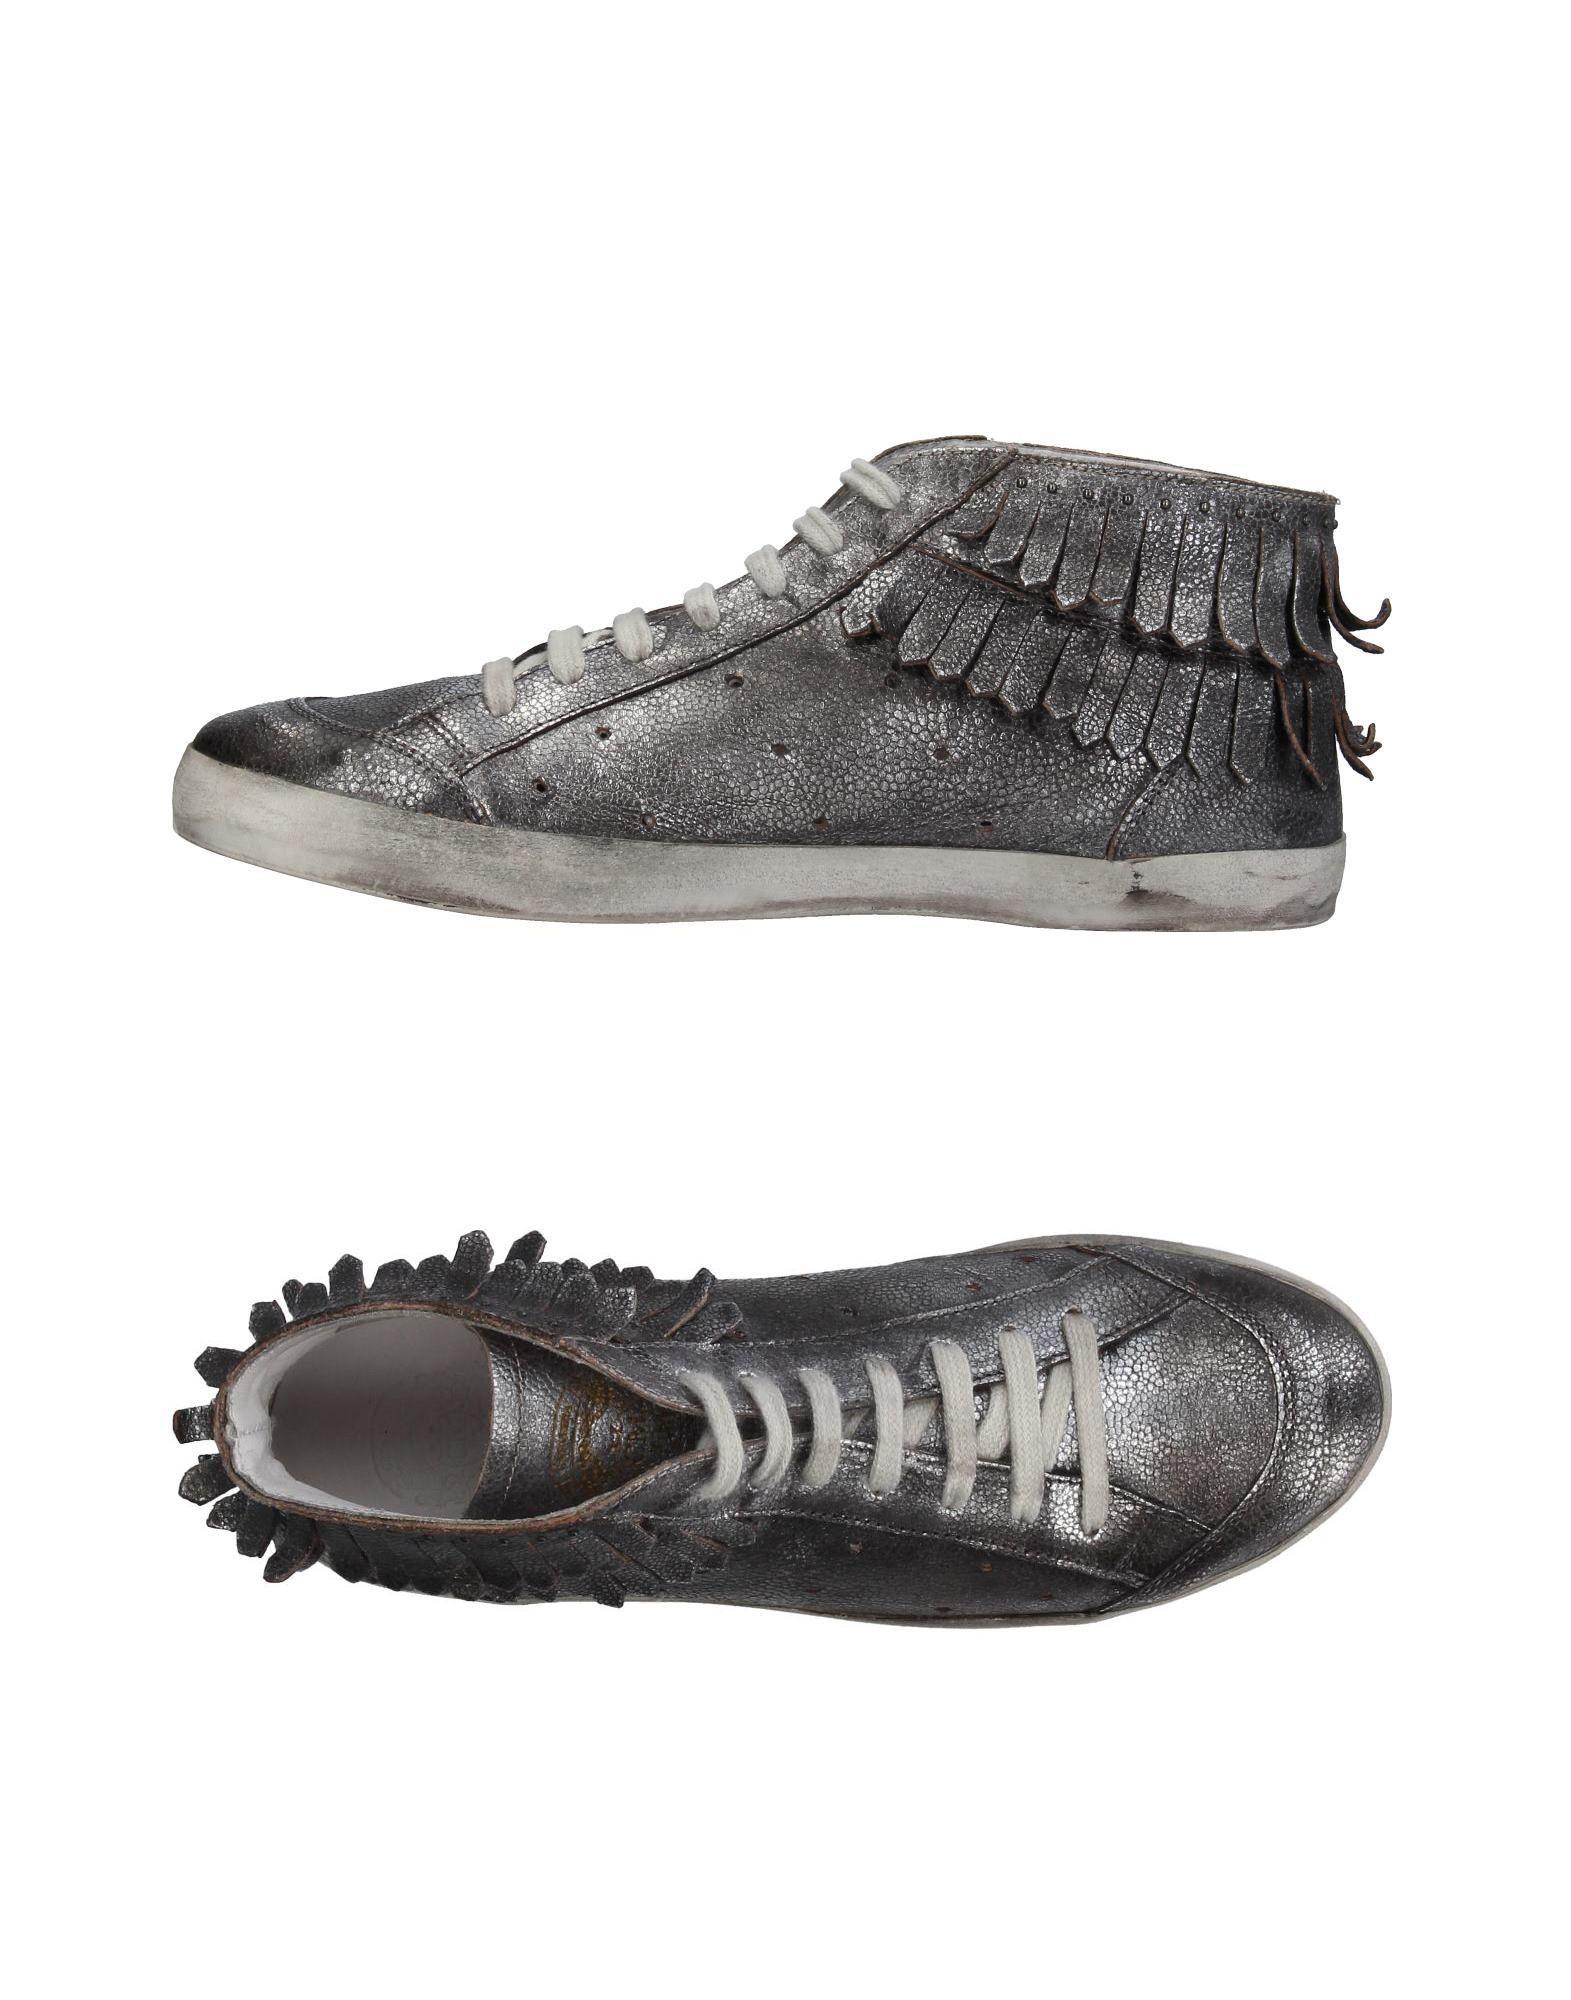 Catarina Martins Sneakers Damen  11378787IJ Gute Qualität beliebte Schuhe